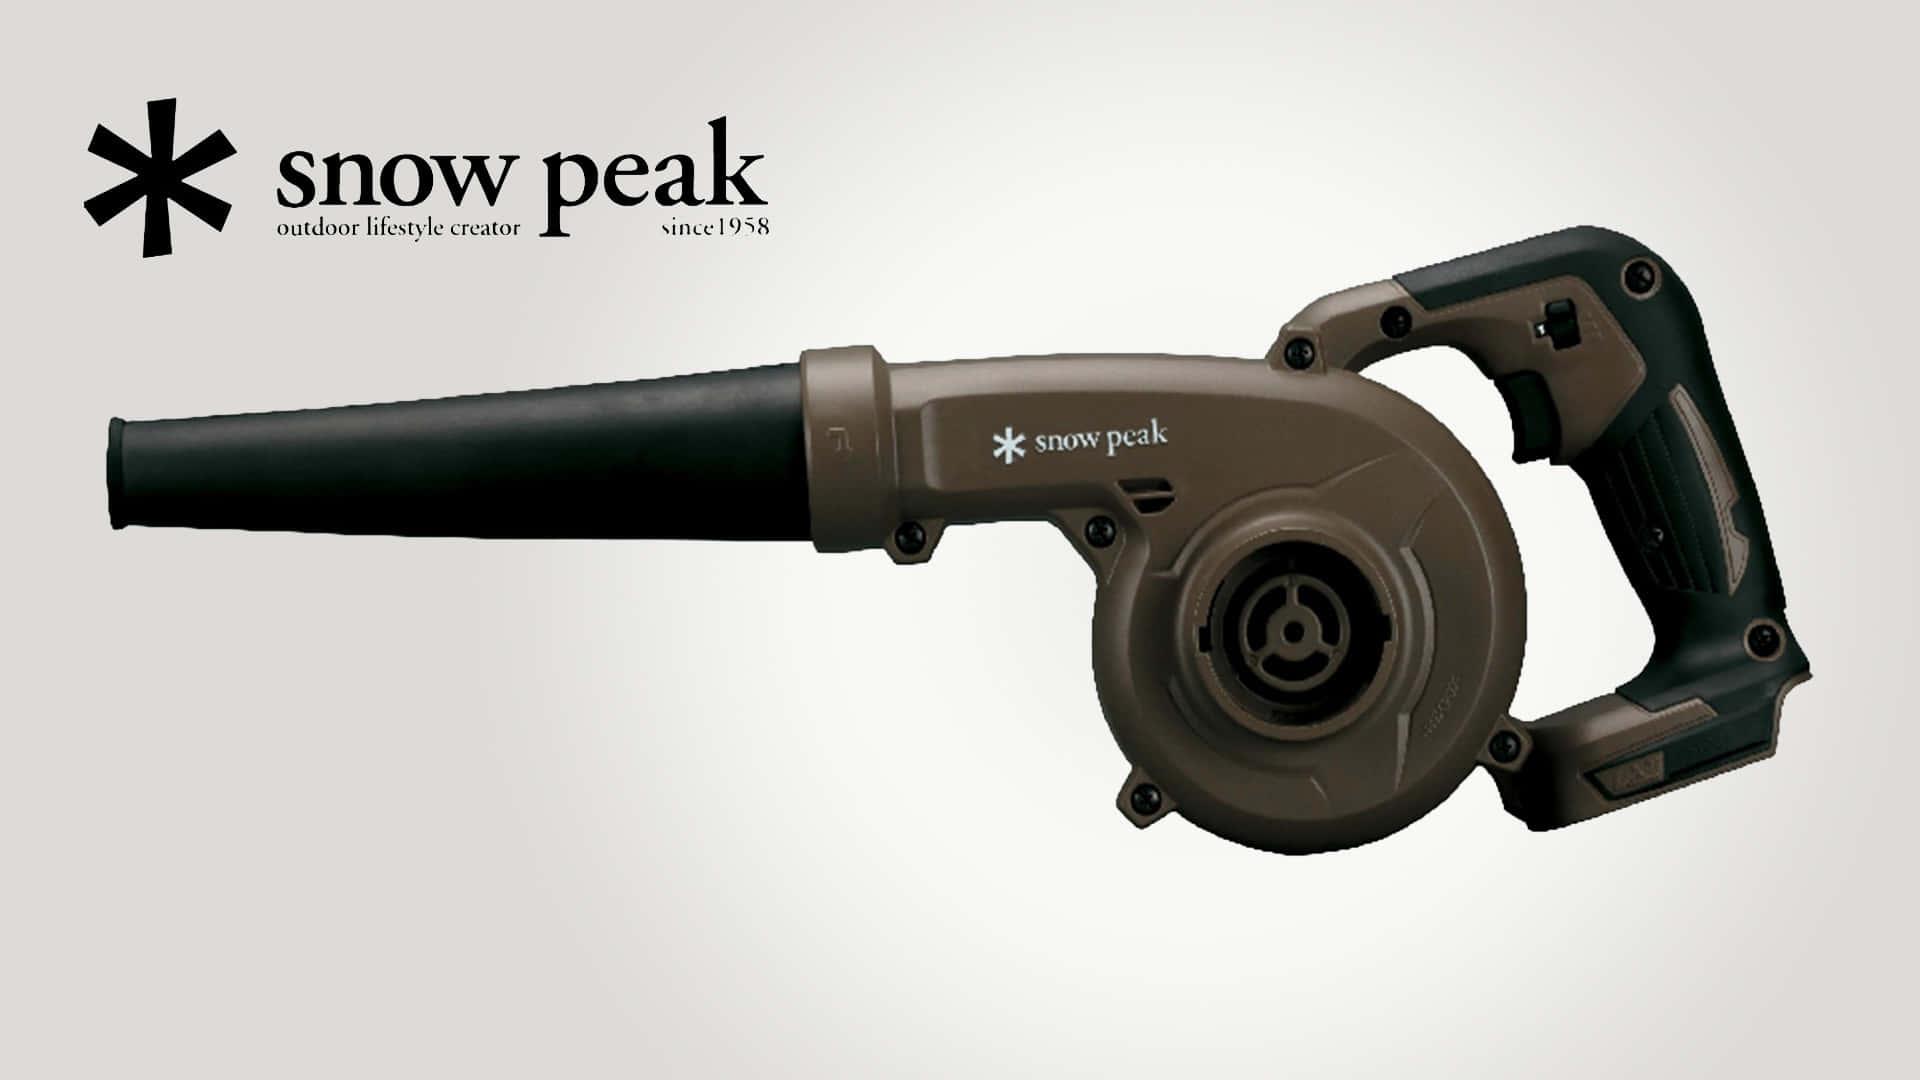 SnowPeak×マキタキャンプギア第二段、MKT-103 フィールドブロワが発売